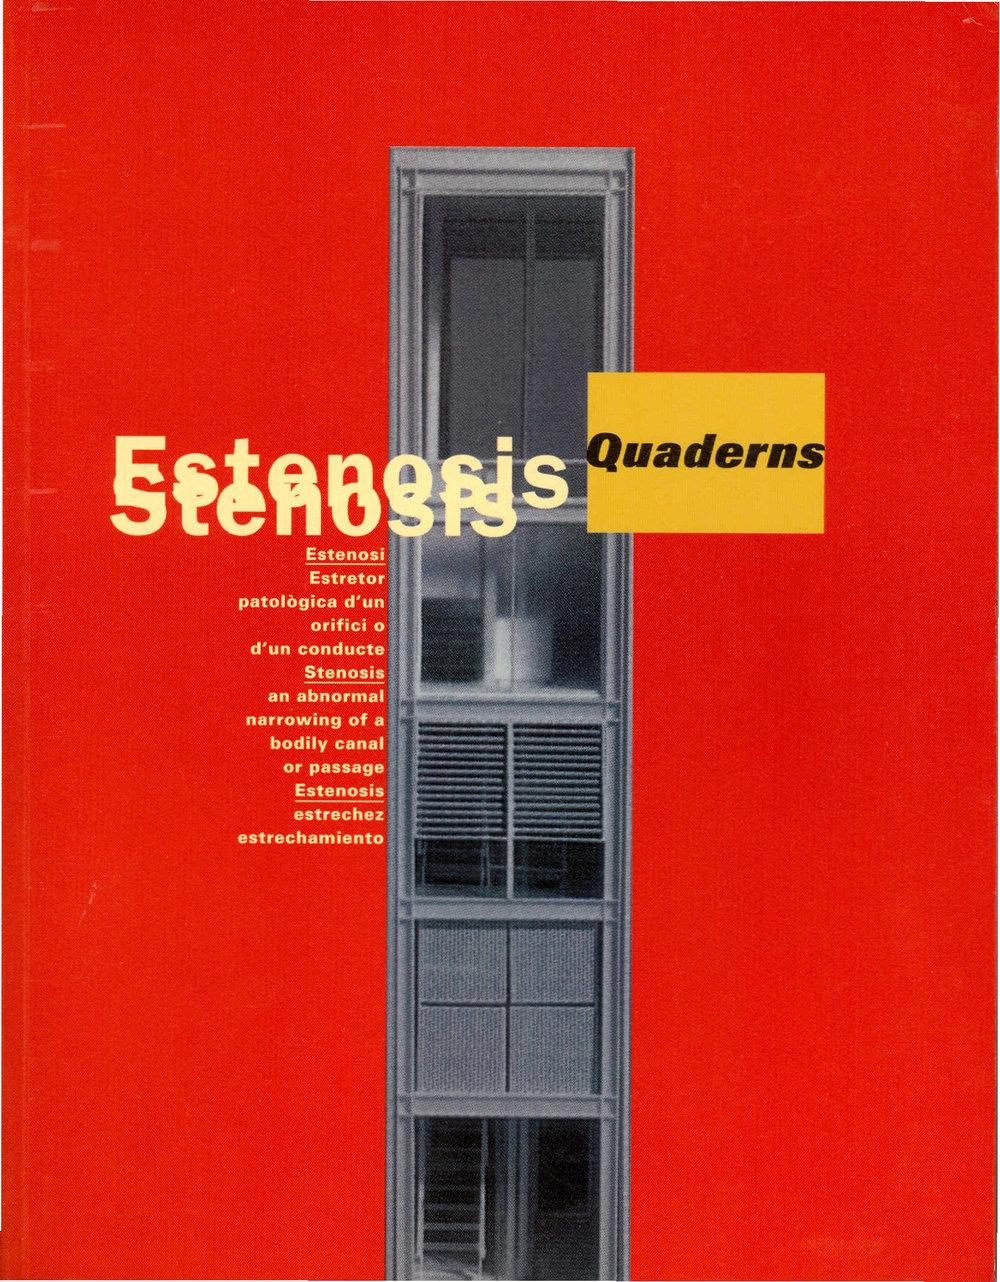 Quaderns_Page_1.jpg